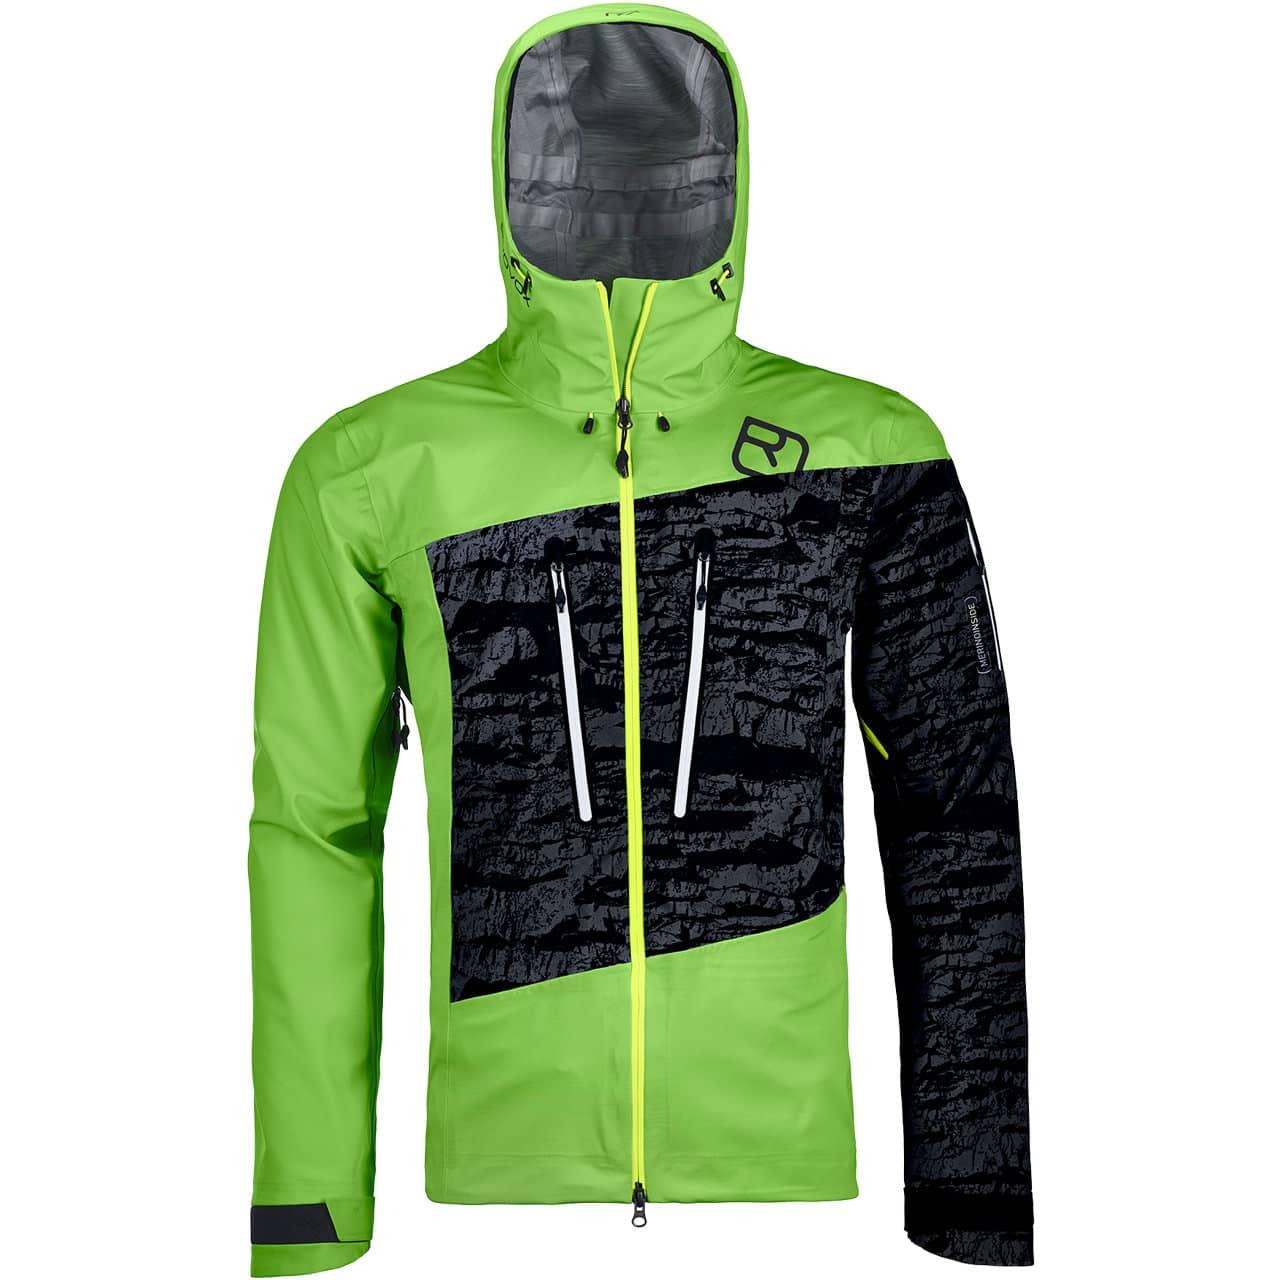 Ortovox Men Jacket GUARDIAN SHELL matcha green